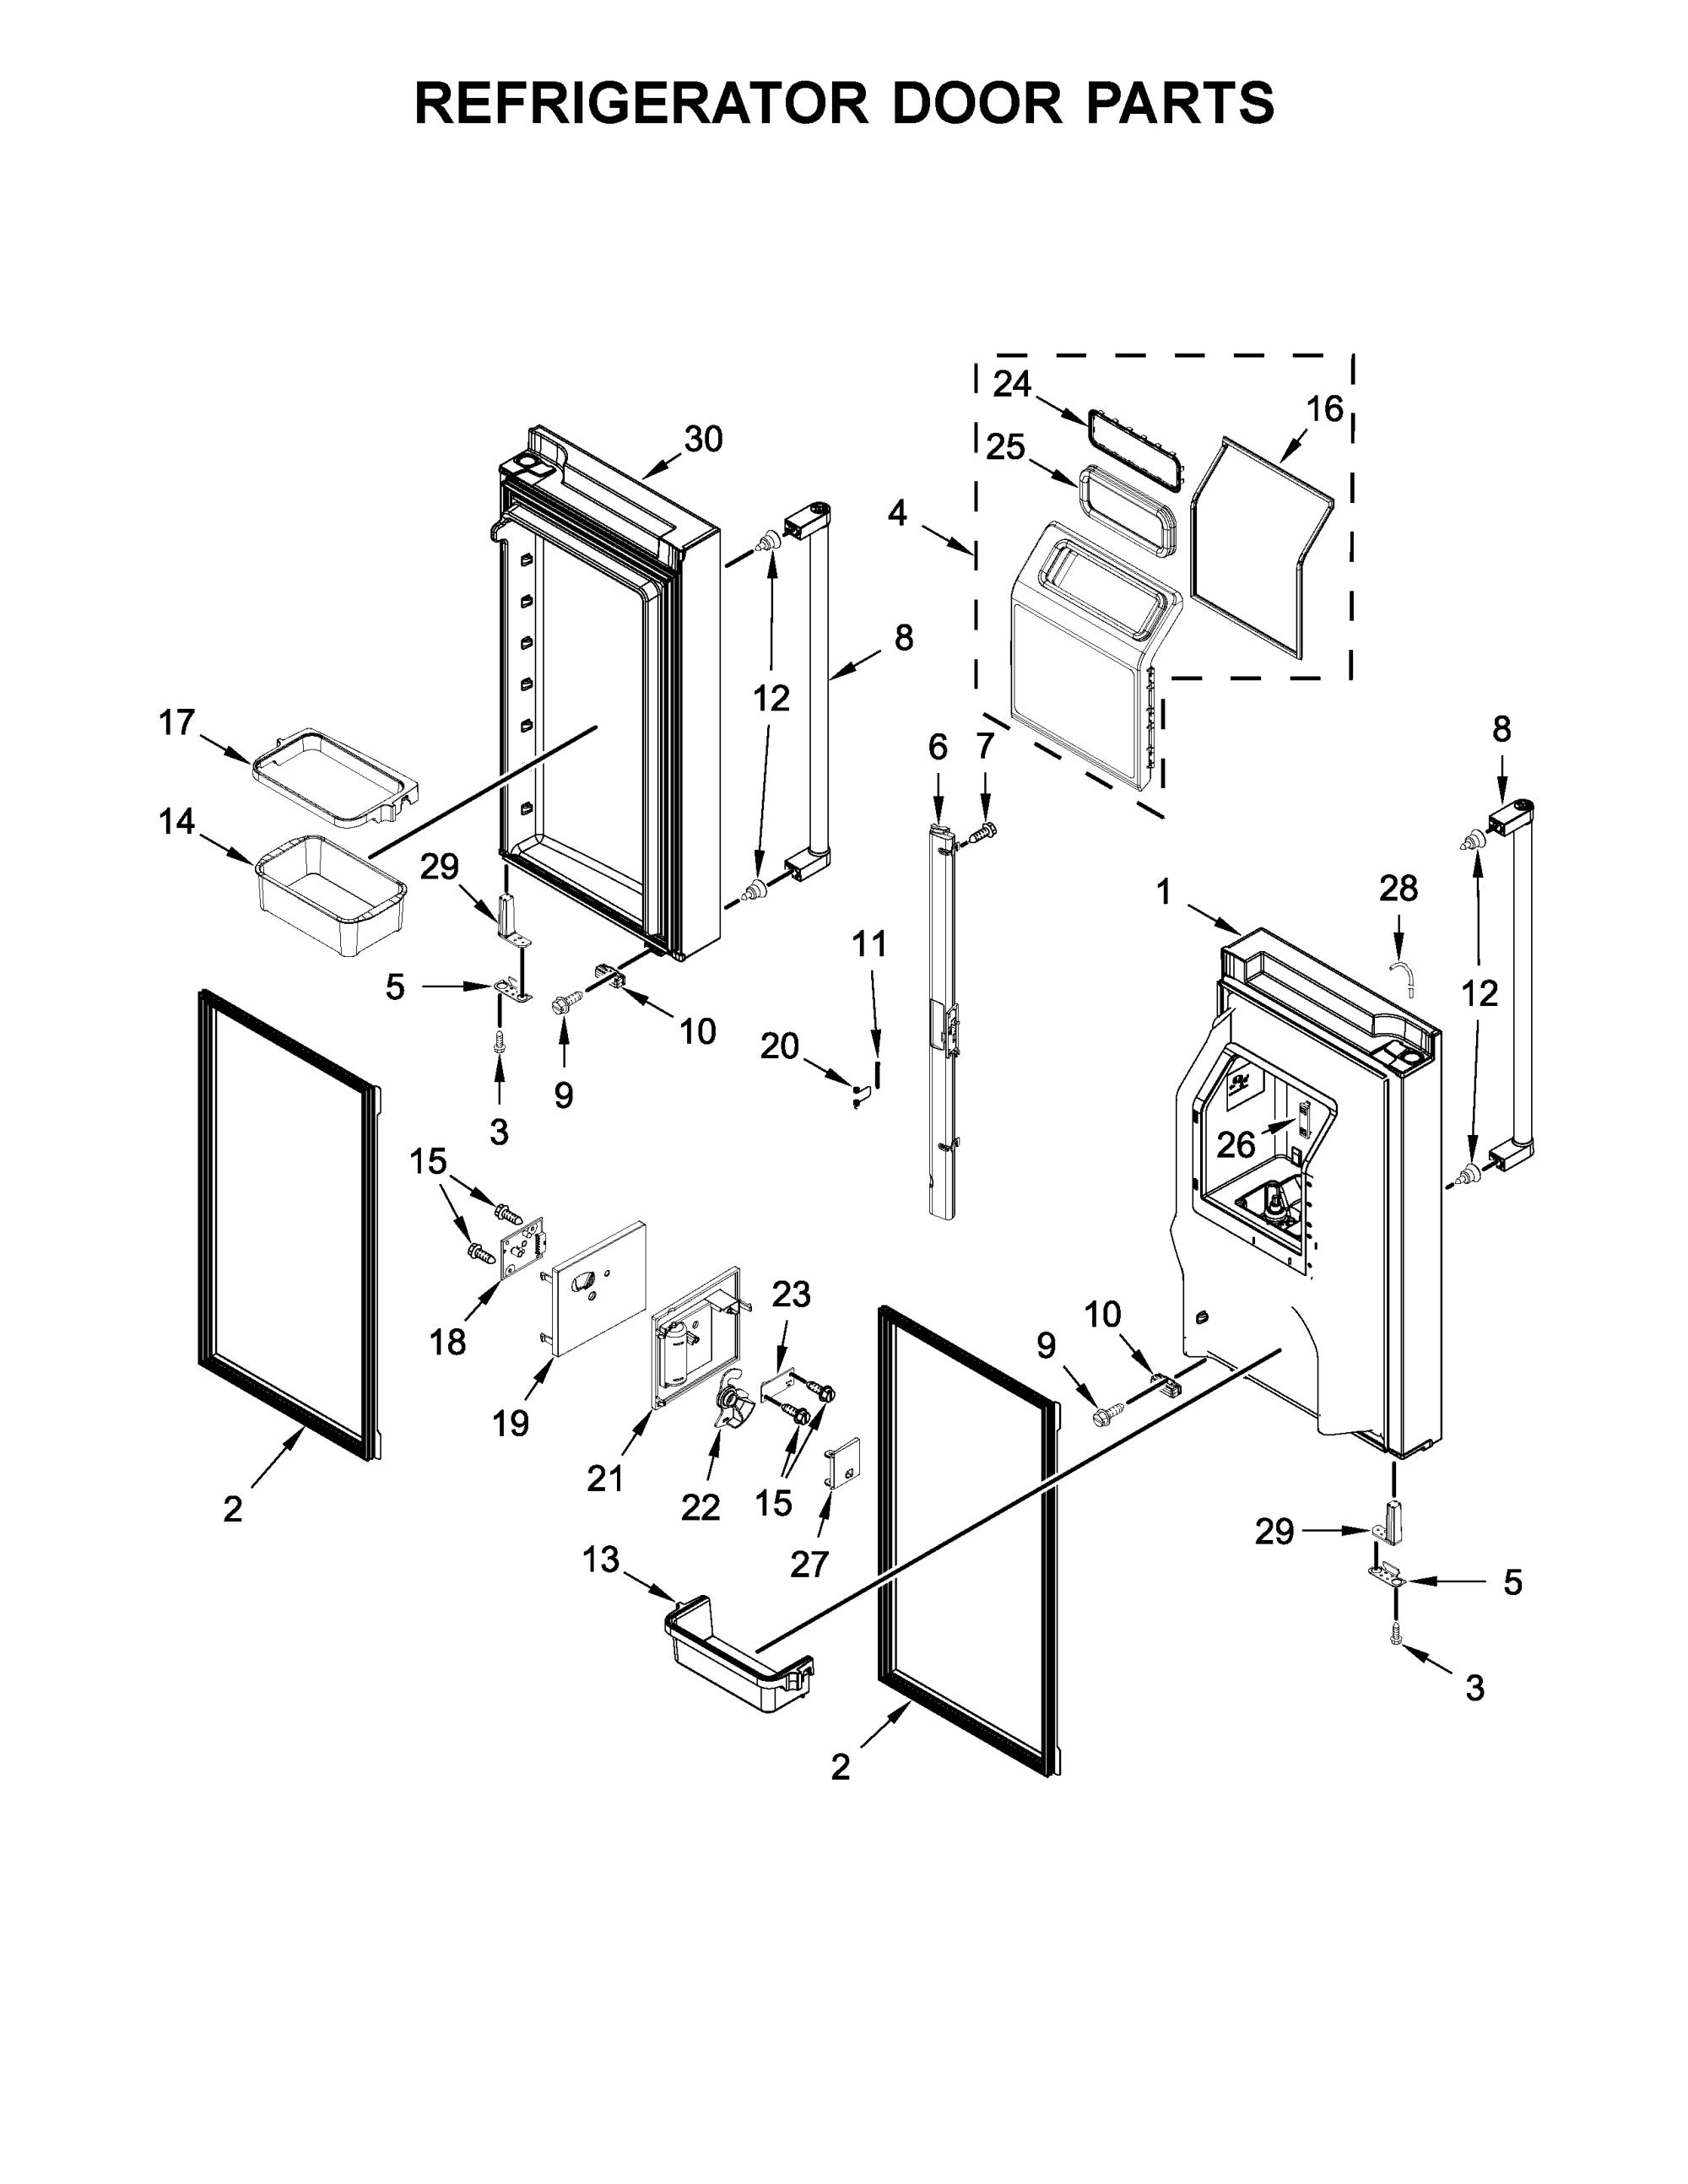 hight resolution of looking for kitchenaid model krmf706ess01 bottom mount refrigerator diagram also kitchenaid refrigerator parts diagram as well kitchenaid